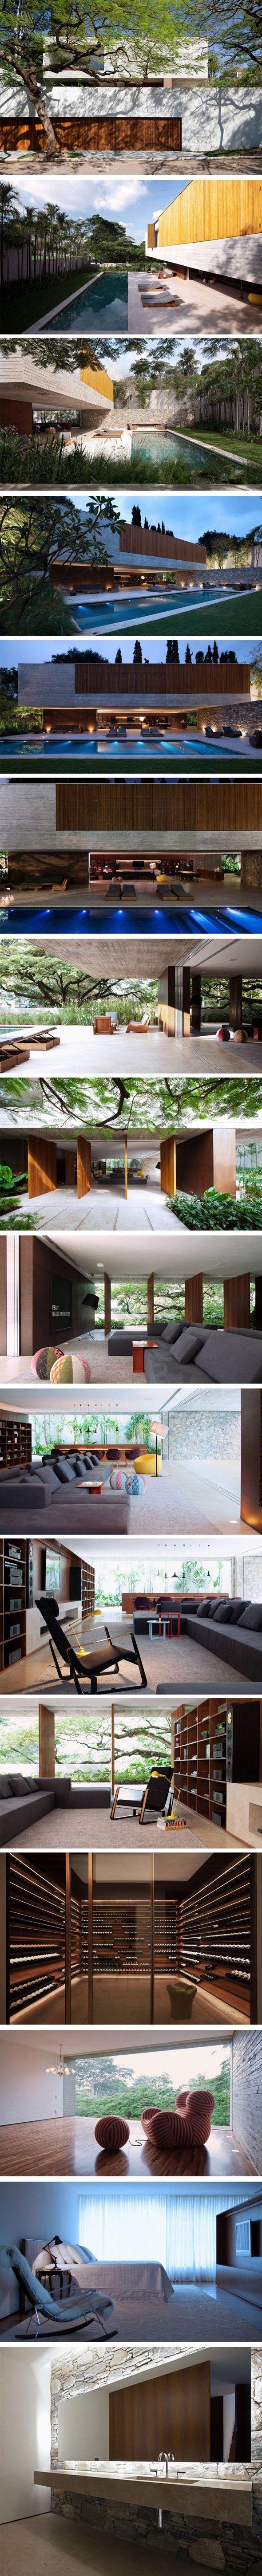 Modern Architecture Journals ipês house par studiomk27 | tes, glasses and heavens